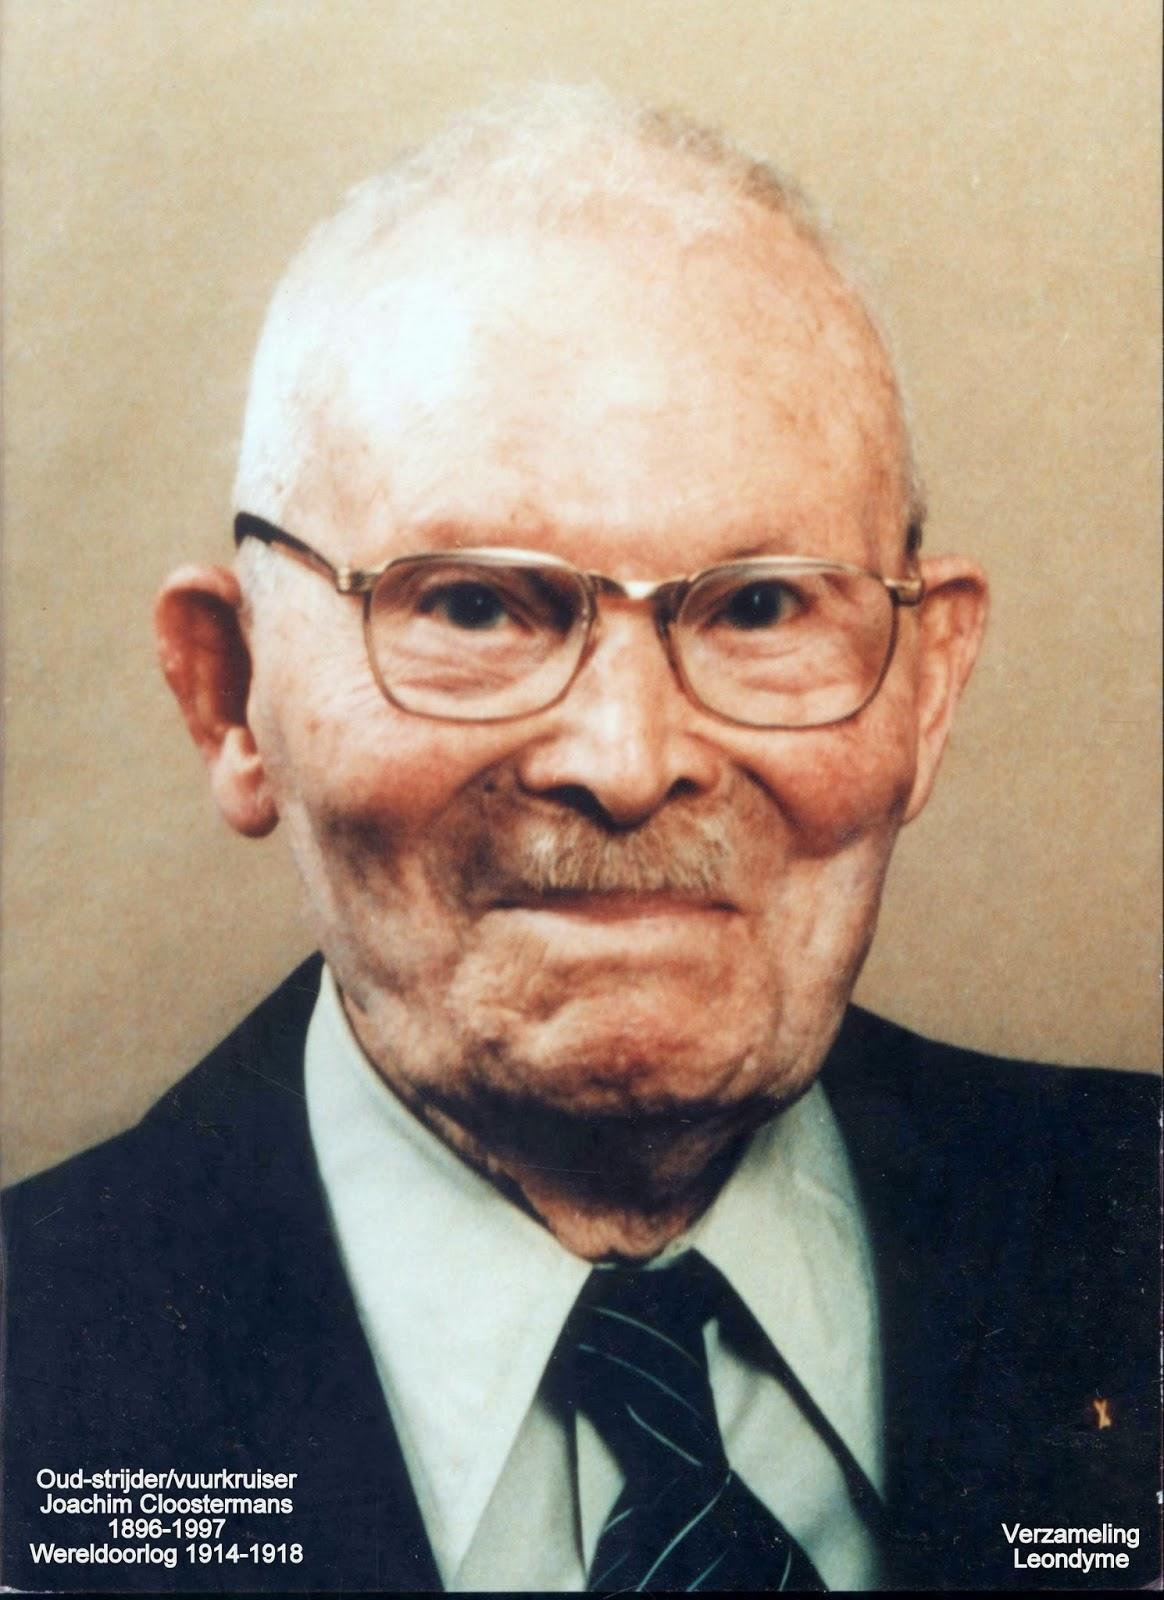 Oud-strijder/vuurkruiser Joachim Cloostermans 1896-1997. Verzameling Leondyme